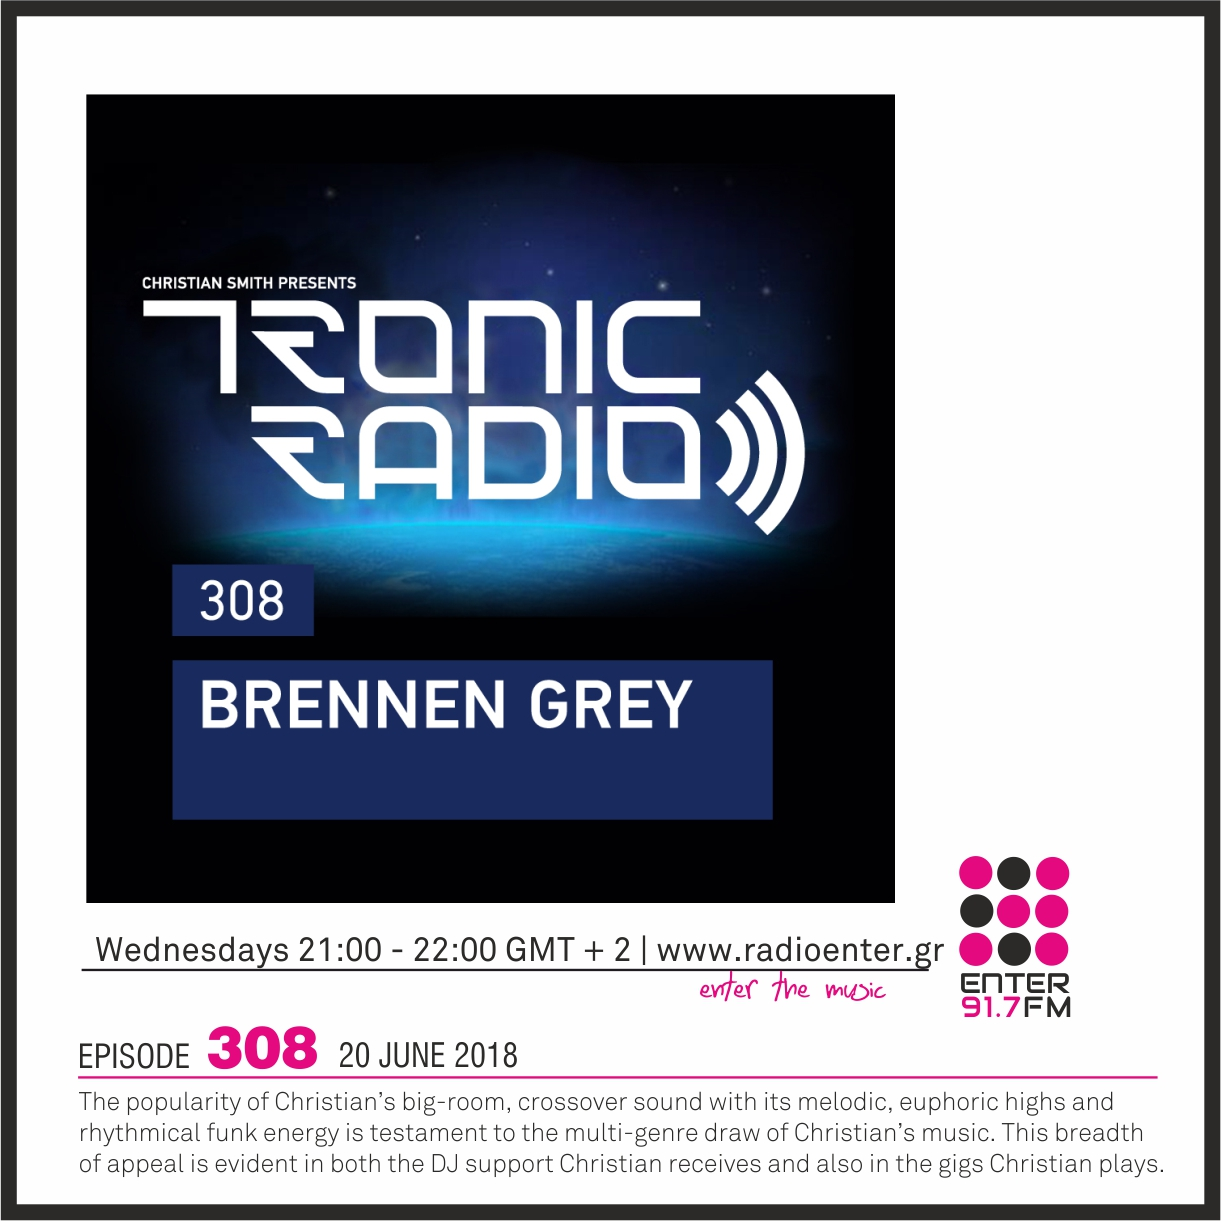 2018.06.20 - Christian Smith Tronic Radio 308